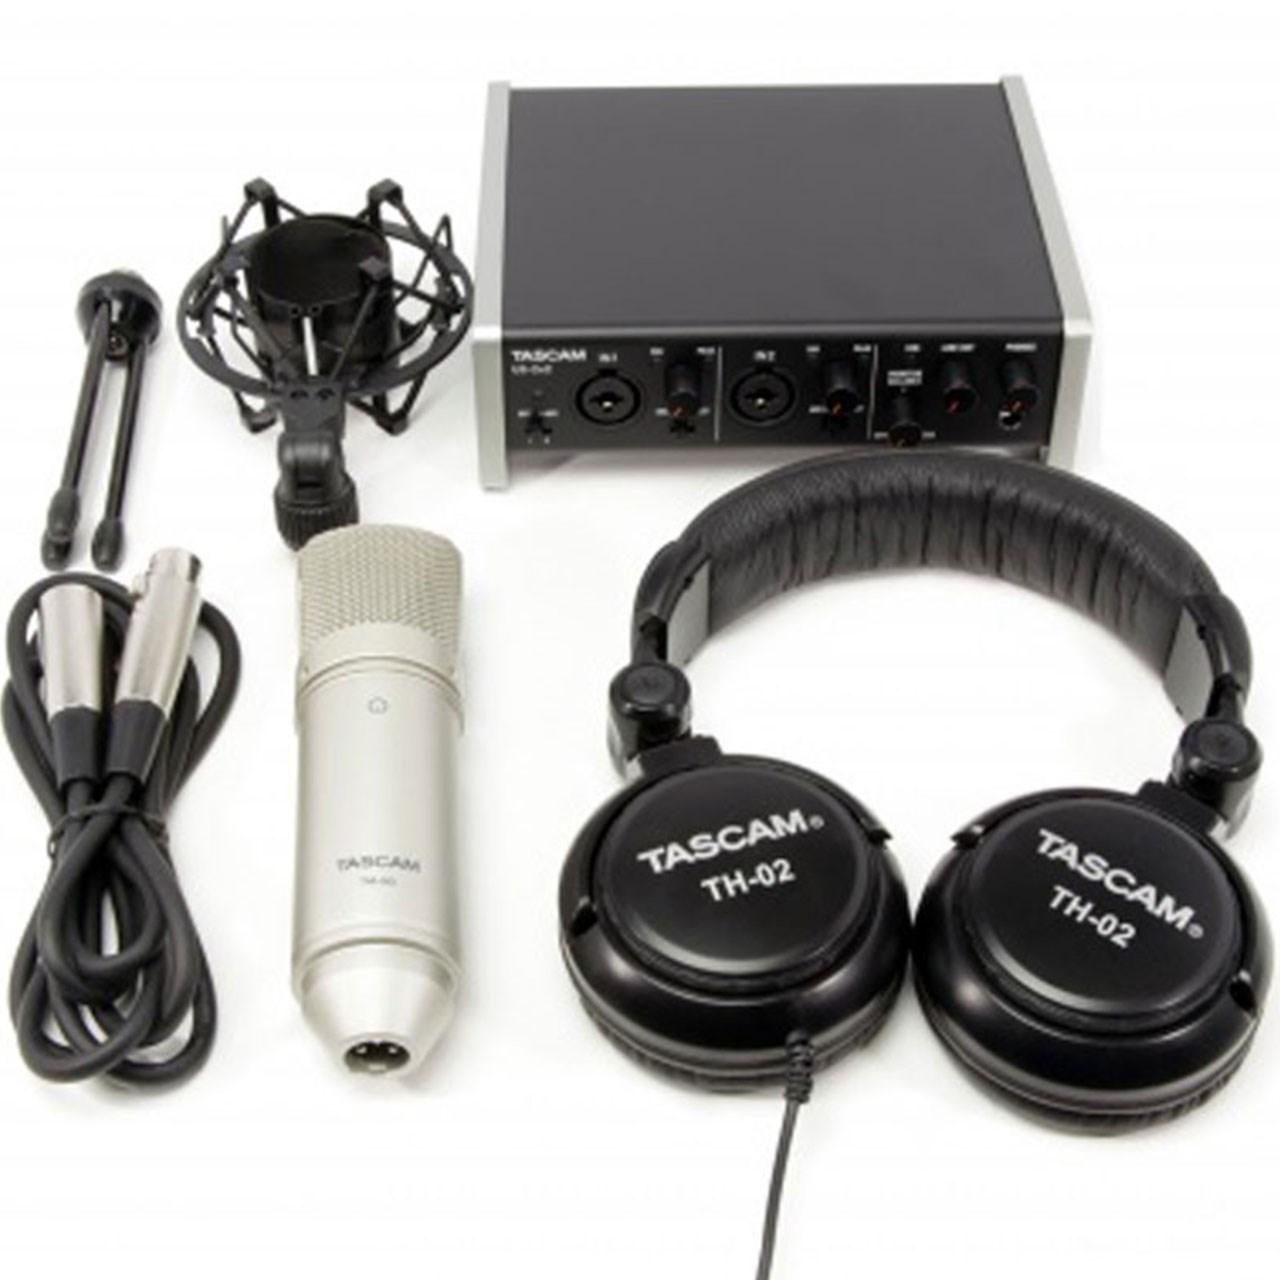 پکیج کامل ضبط استودیو تسکم مدل 2X2 Track Pack